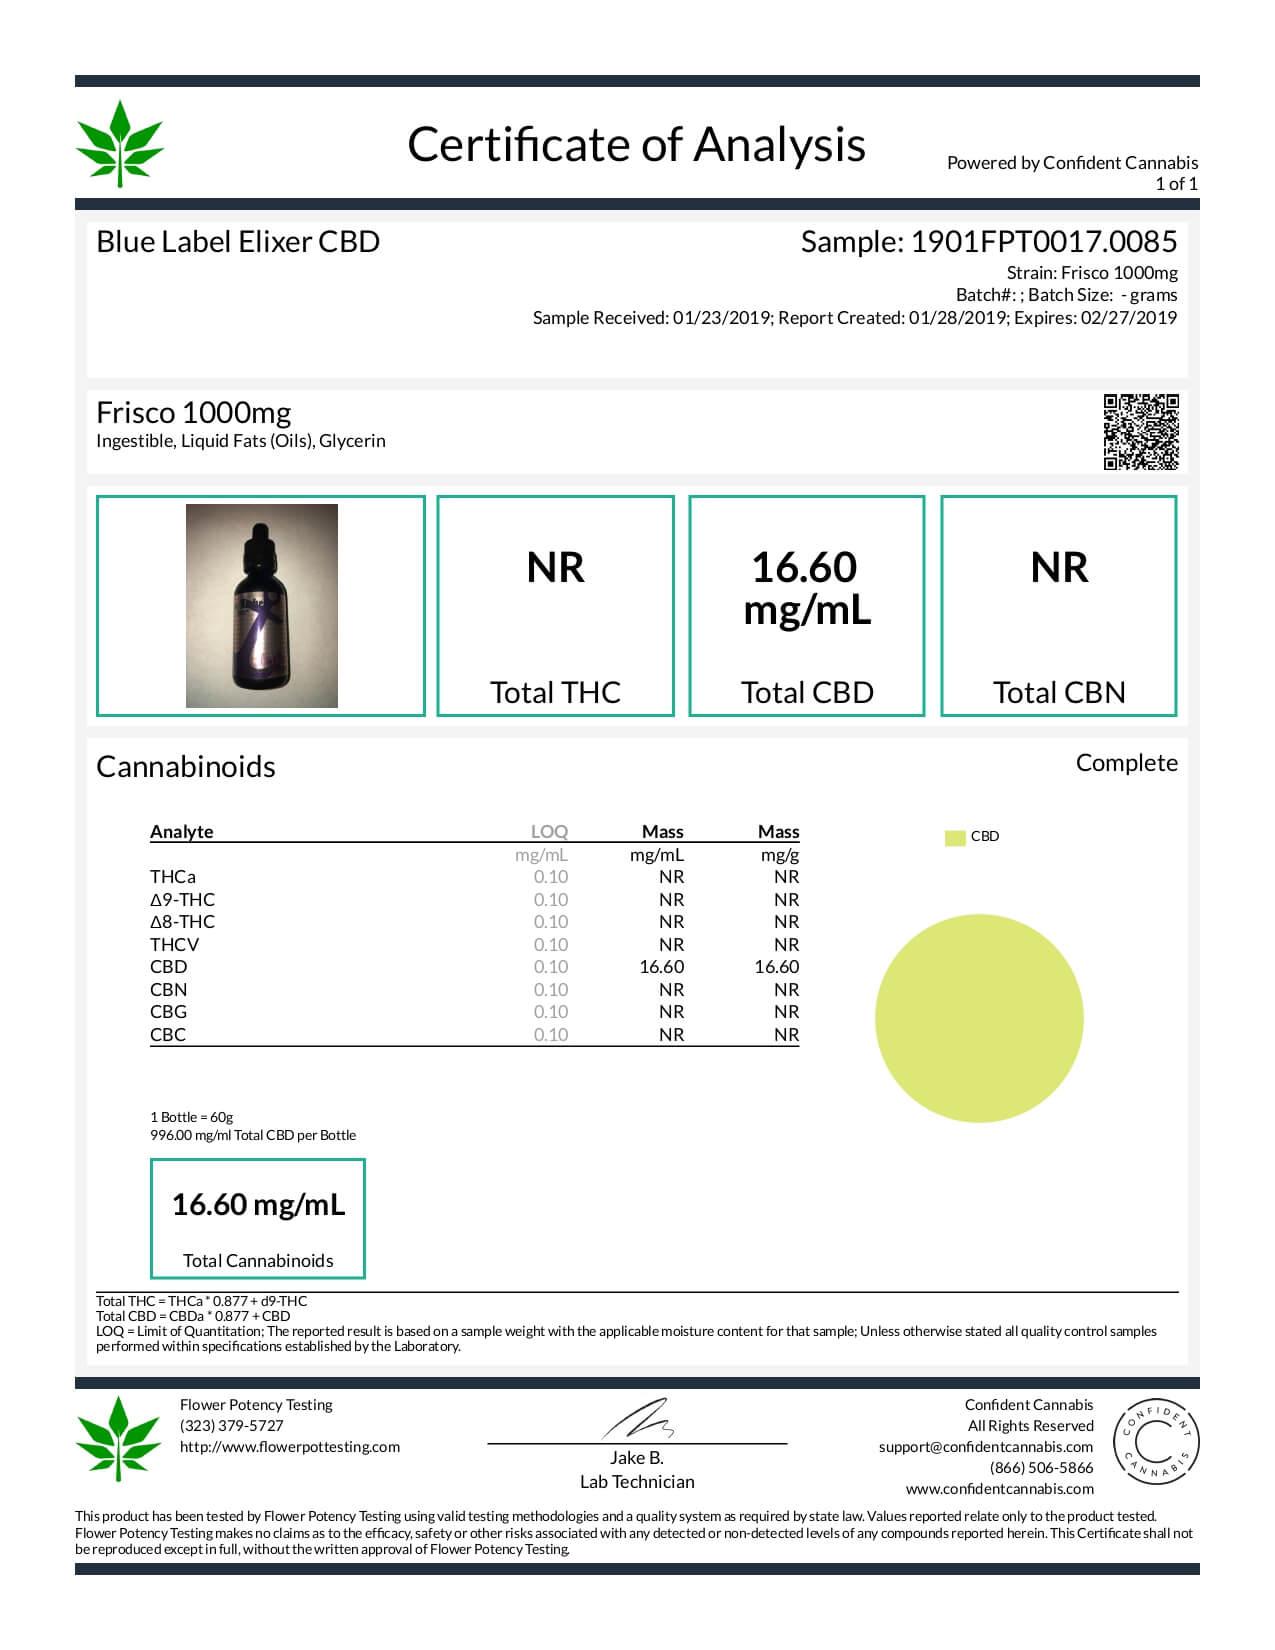 Blue Label CBD Vape Juice Frisco 1000mg Lab Report